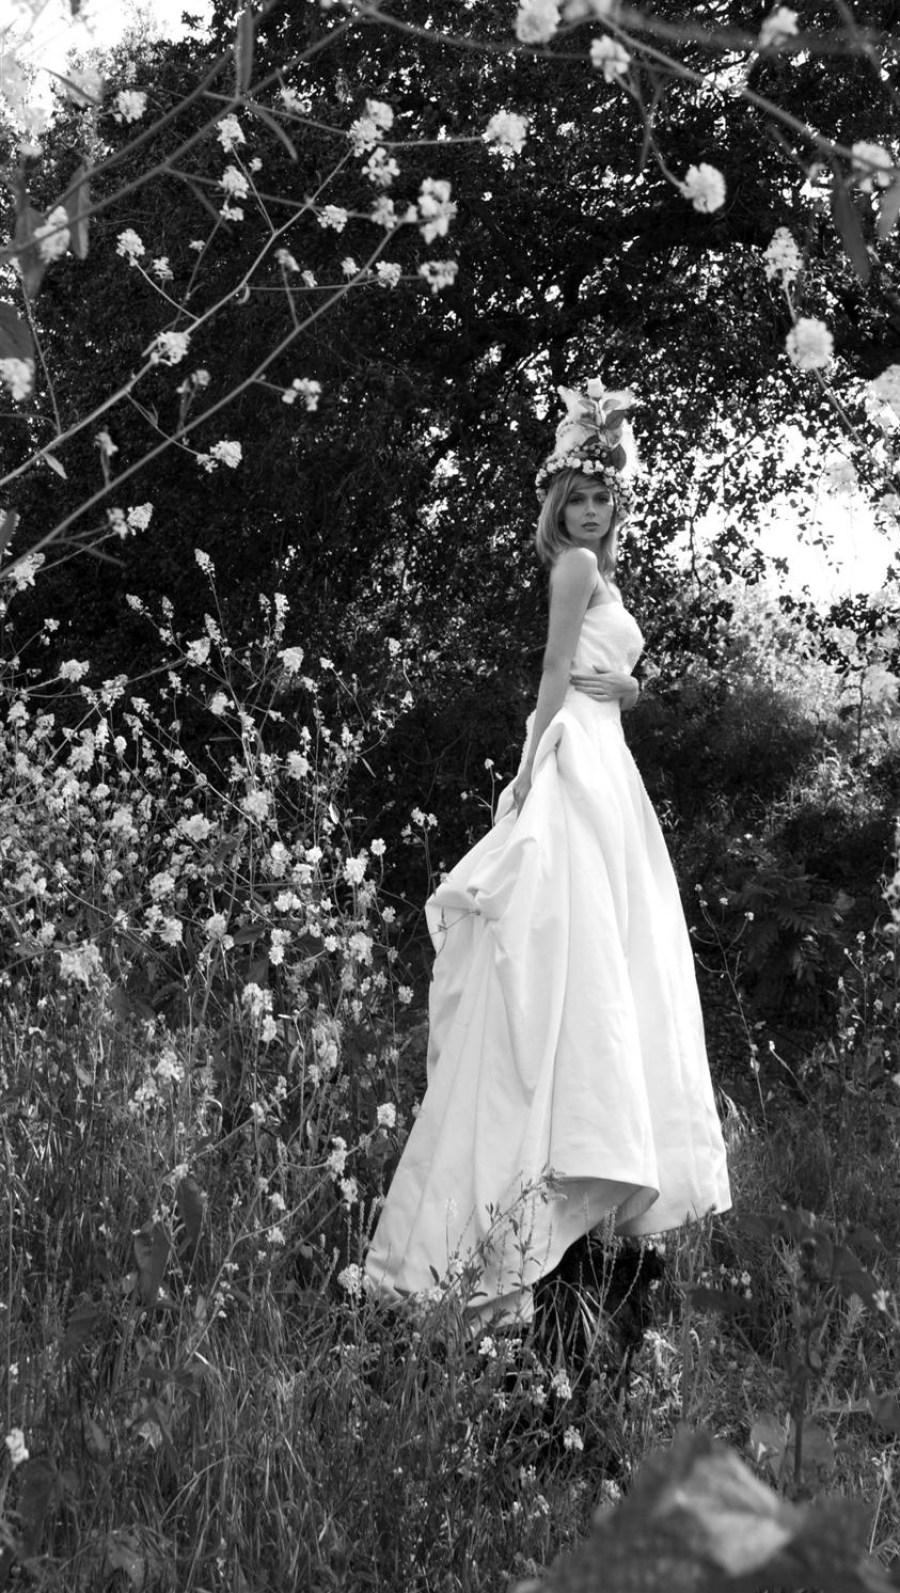 Vogue style wedding photography by celebrity fashion photographer Shaun Alexander